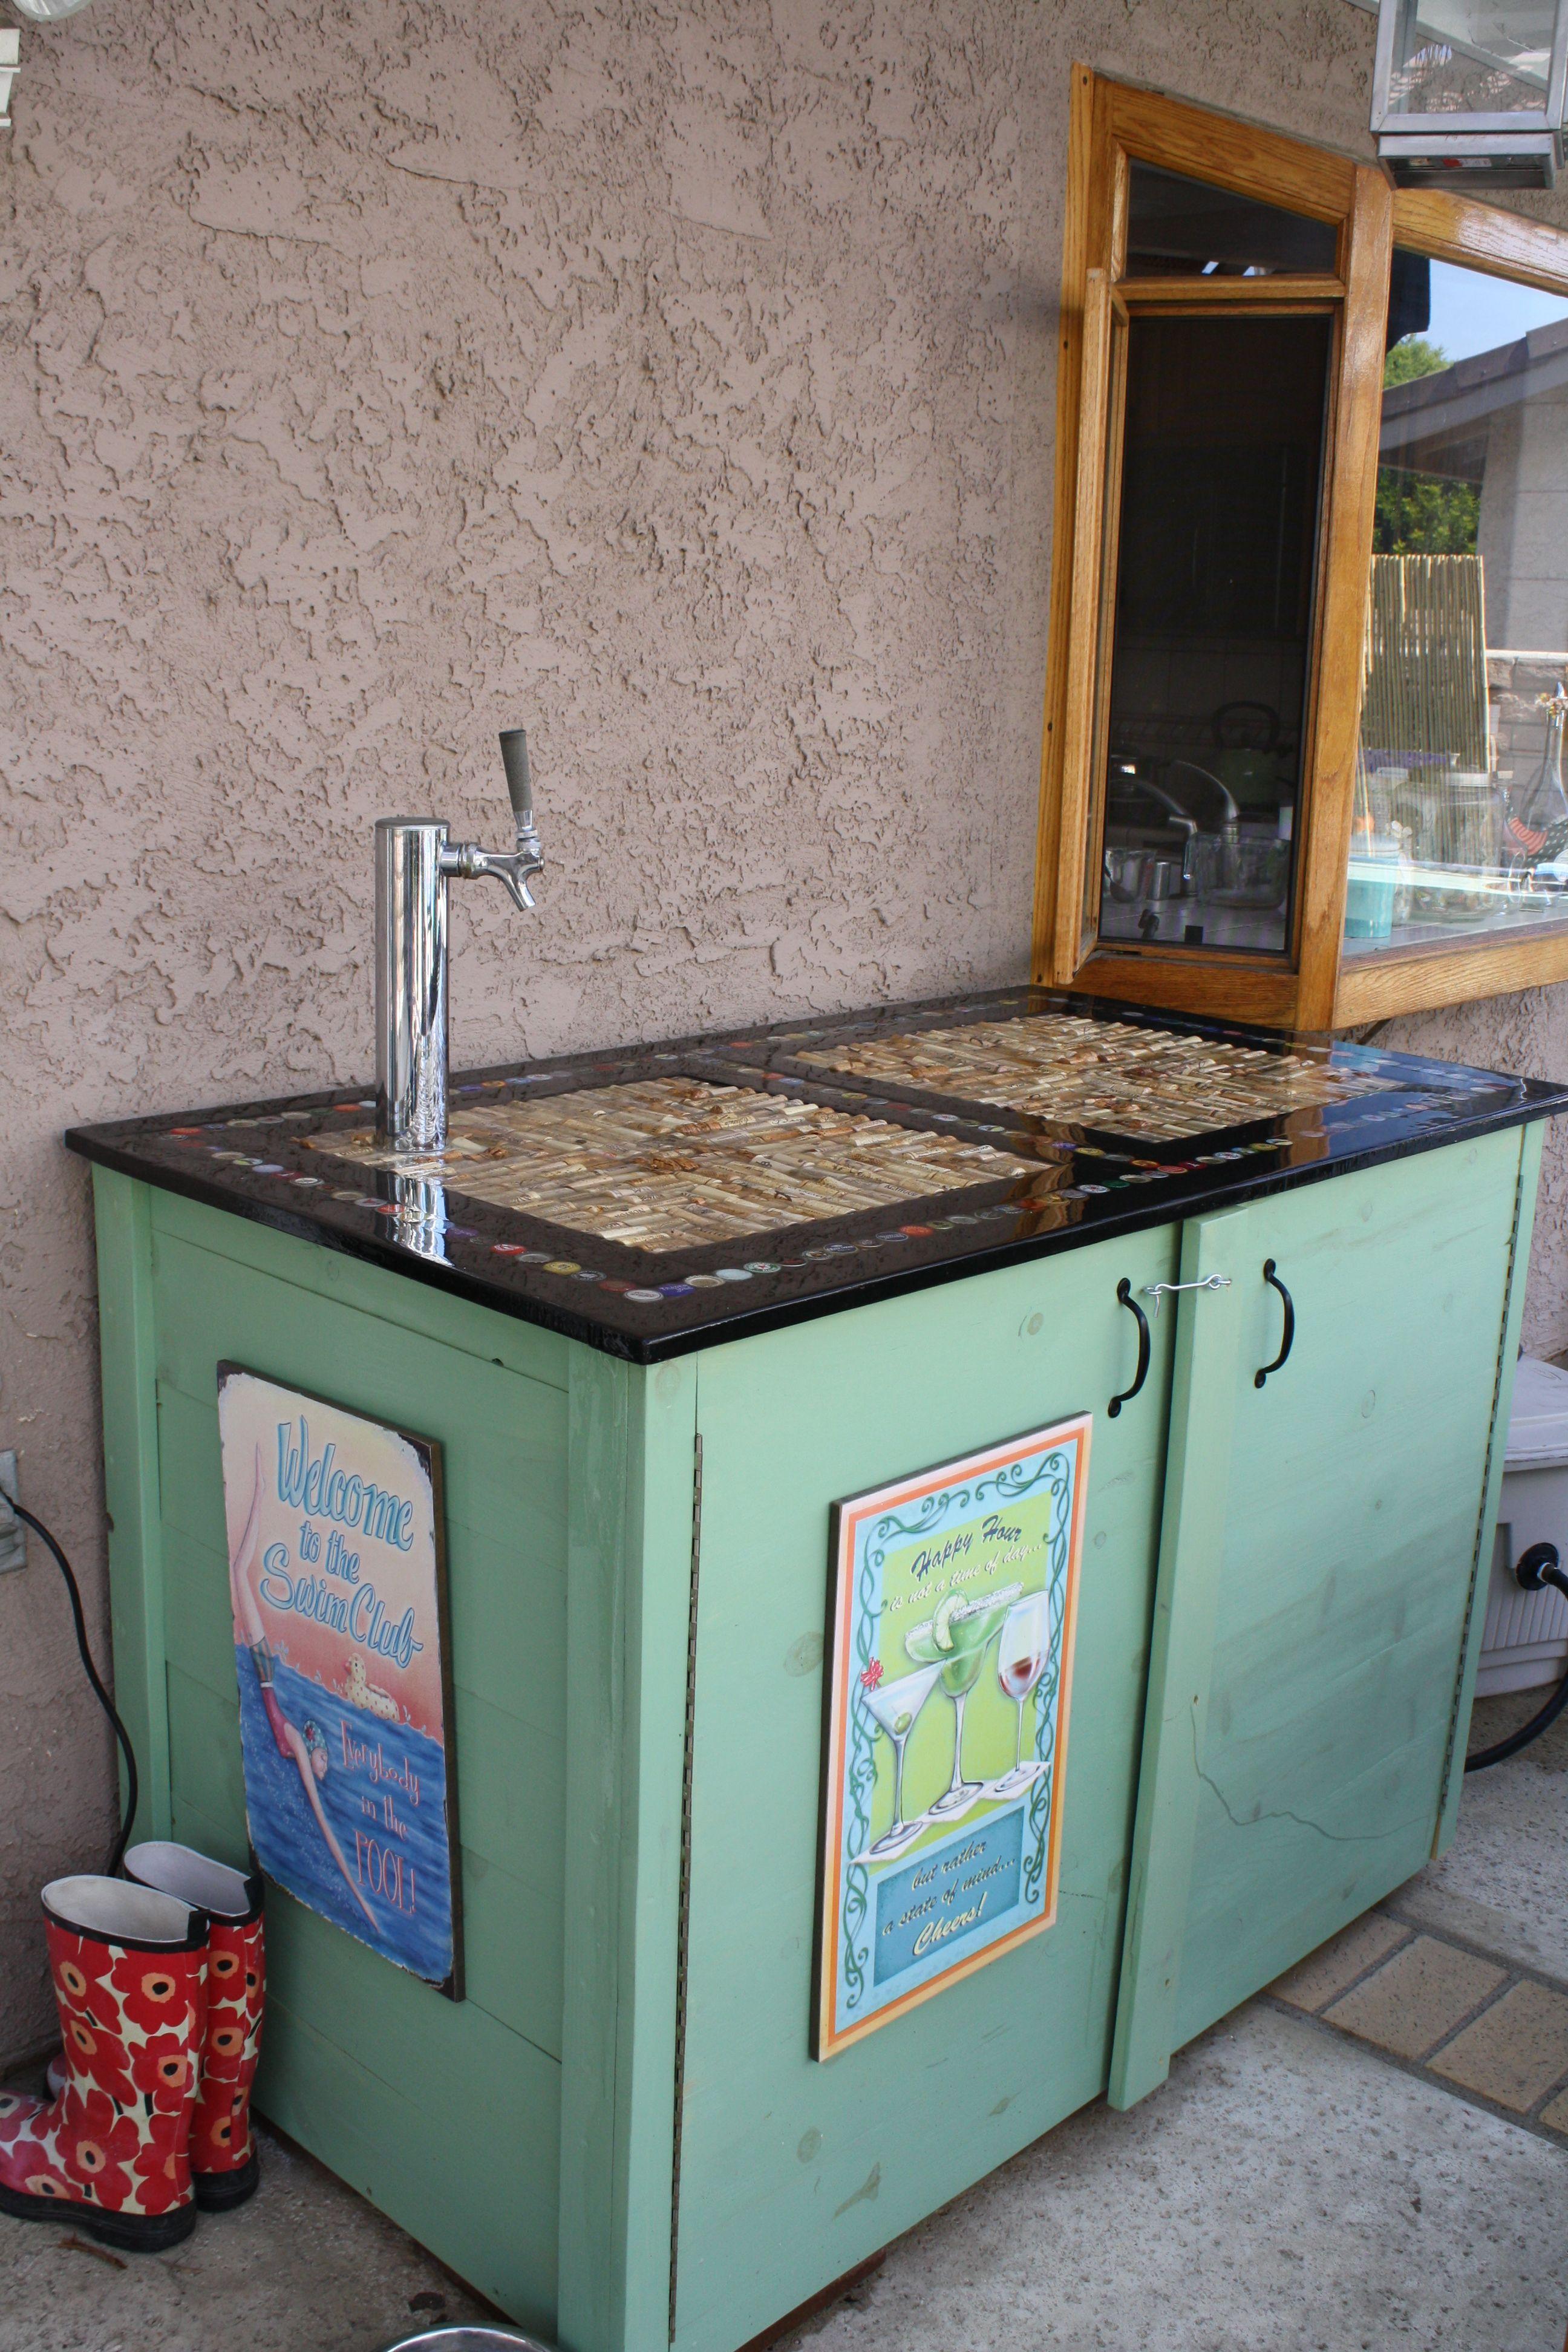 diy bar top on kegerator cabinet kegerator cabinet diy bar hot tub bar on outdoor kitchen kegerator id=64157